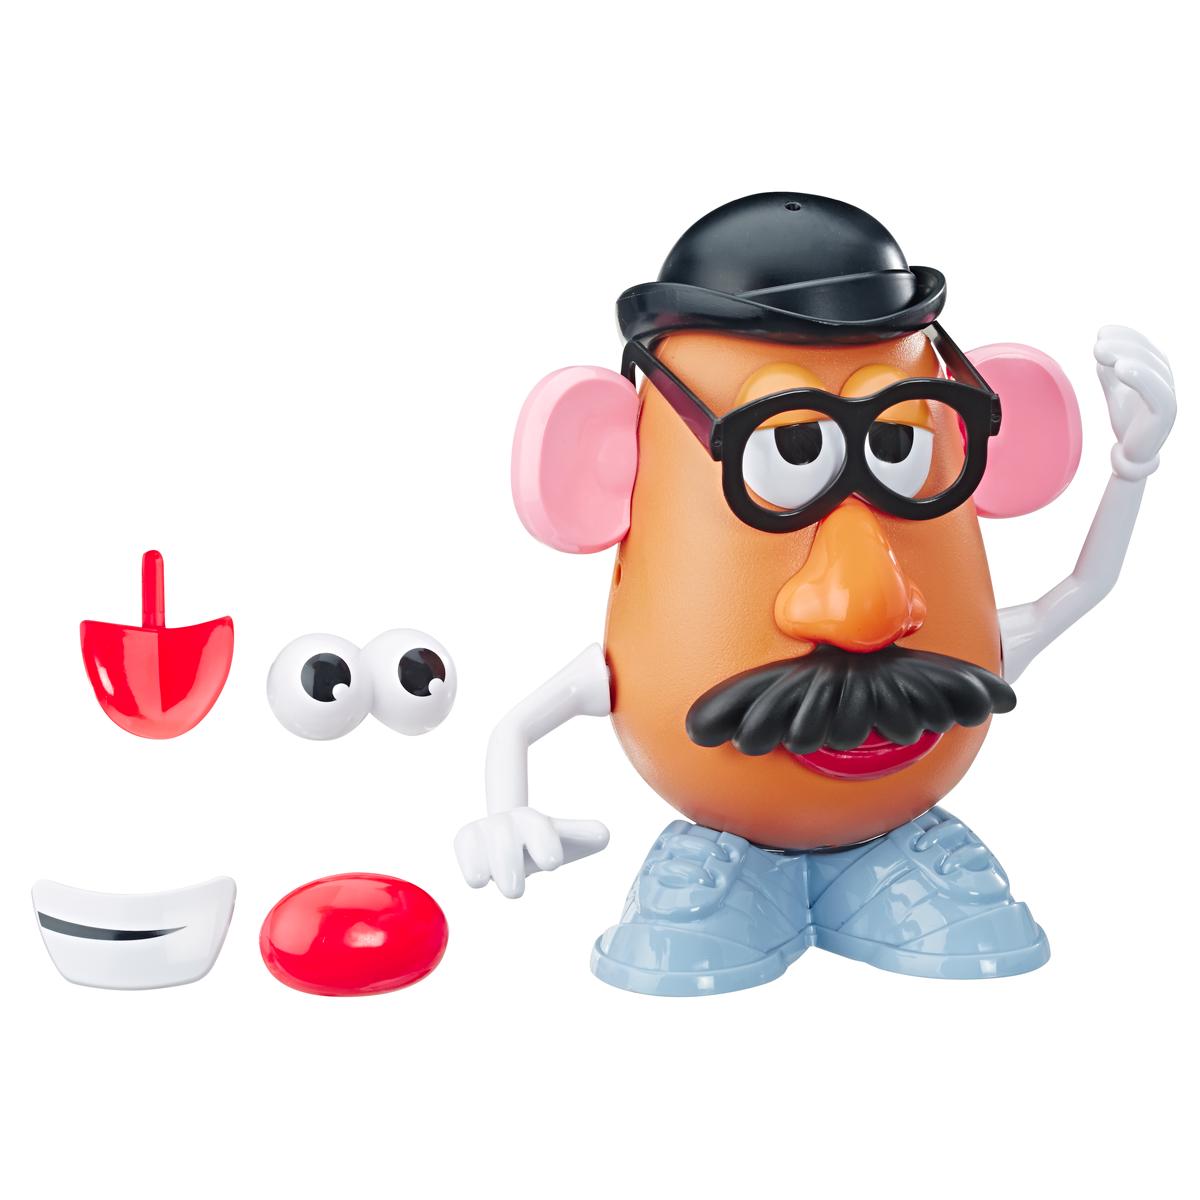 Playskool Disney Pixar Toy Story 4 Mr Potato Head